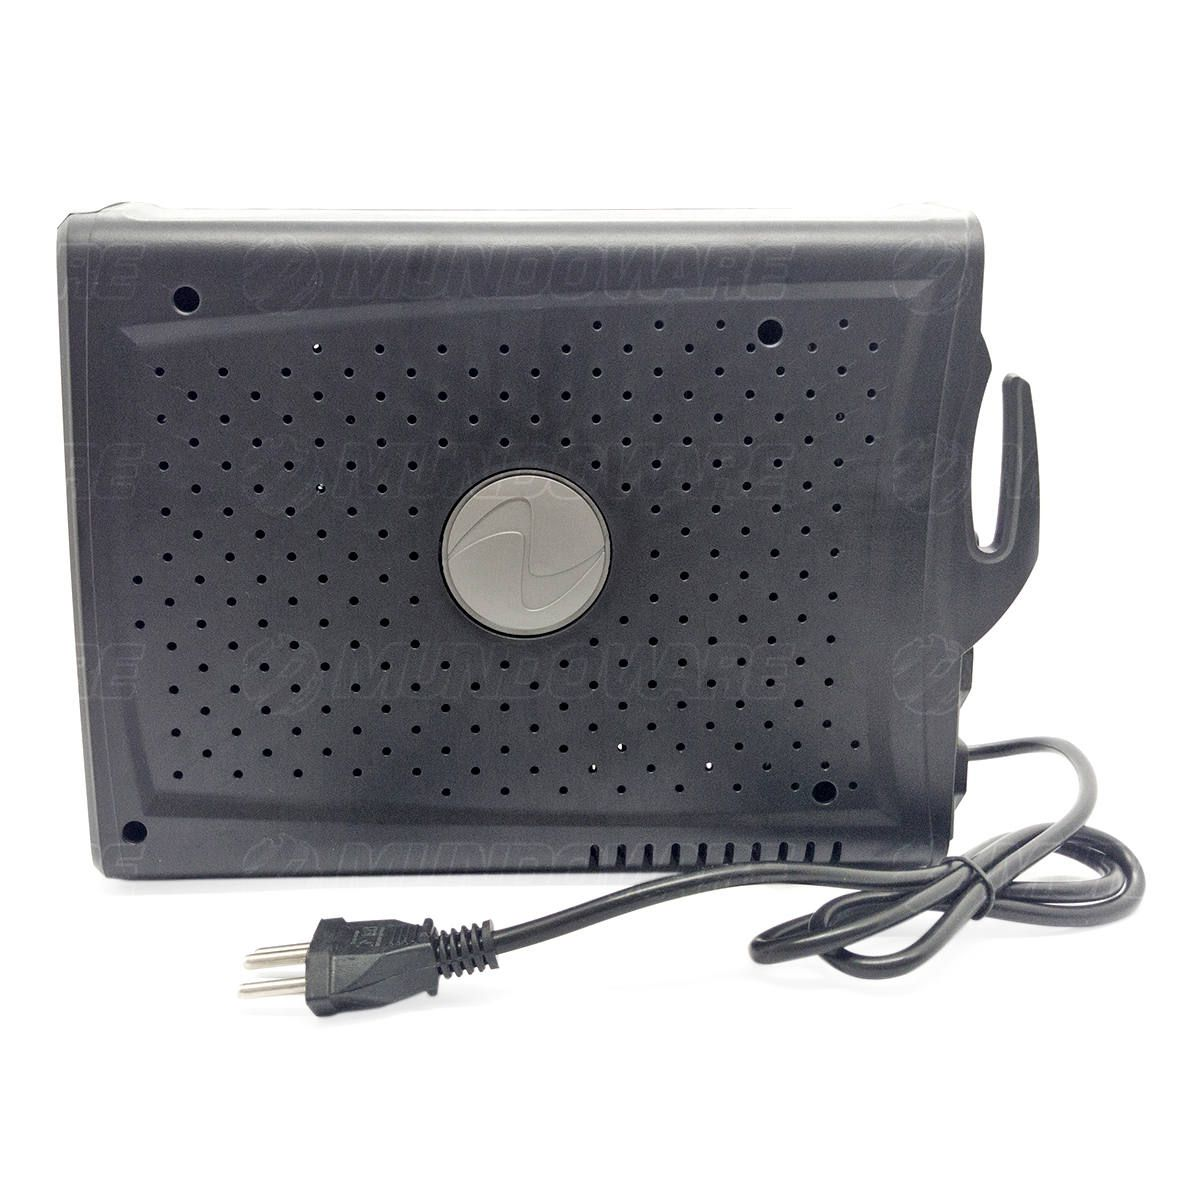 Nobreak 600VA 300W 6 Tomadas Troca Fácil de Bateria Bivolt PWM c/ Filtro e Estabilizador Ragtech Save Home STD-TI 4125